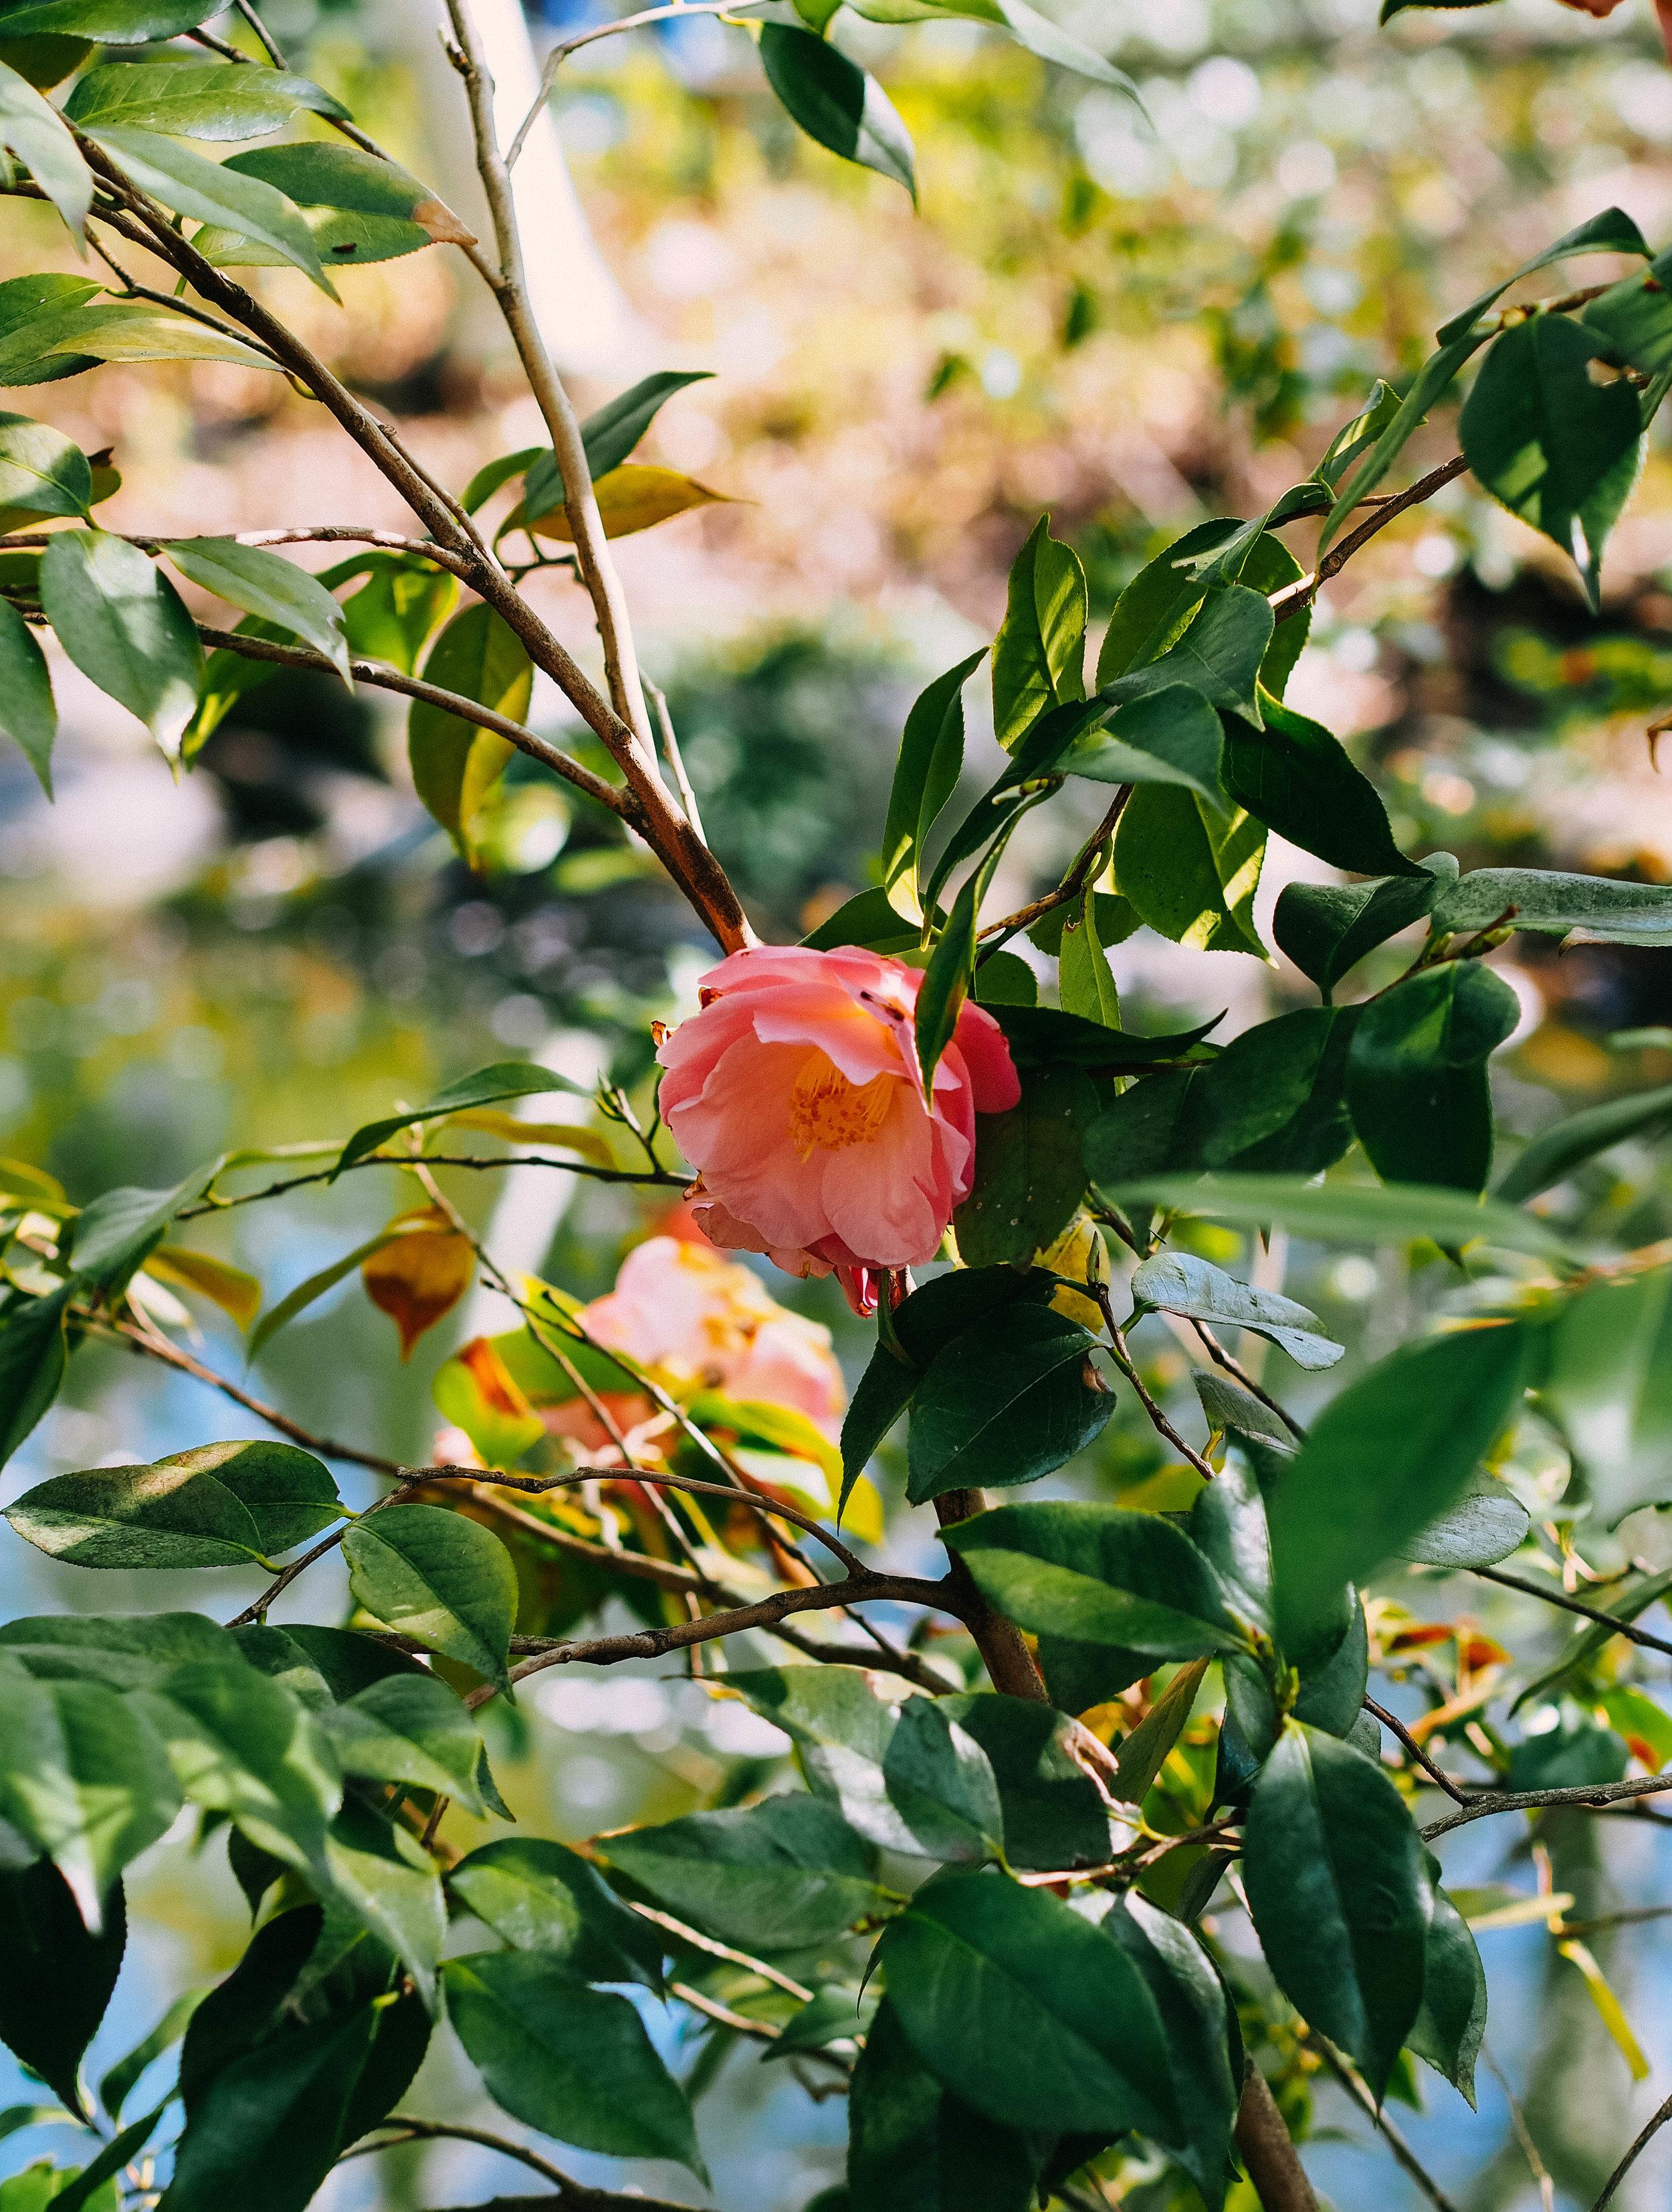 Brooklyn Botanic (Garden) Beauty -- 1/320 sec. f/2.5